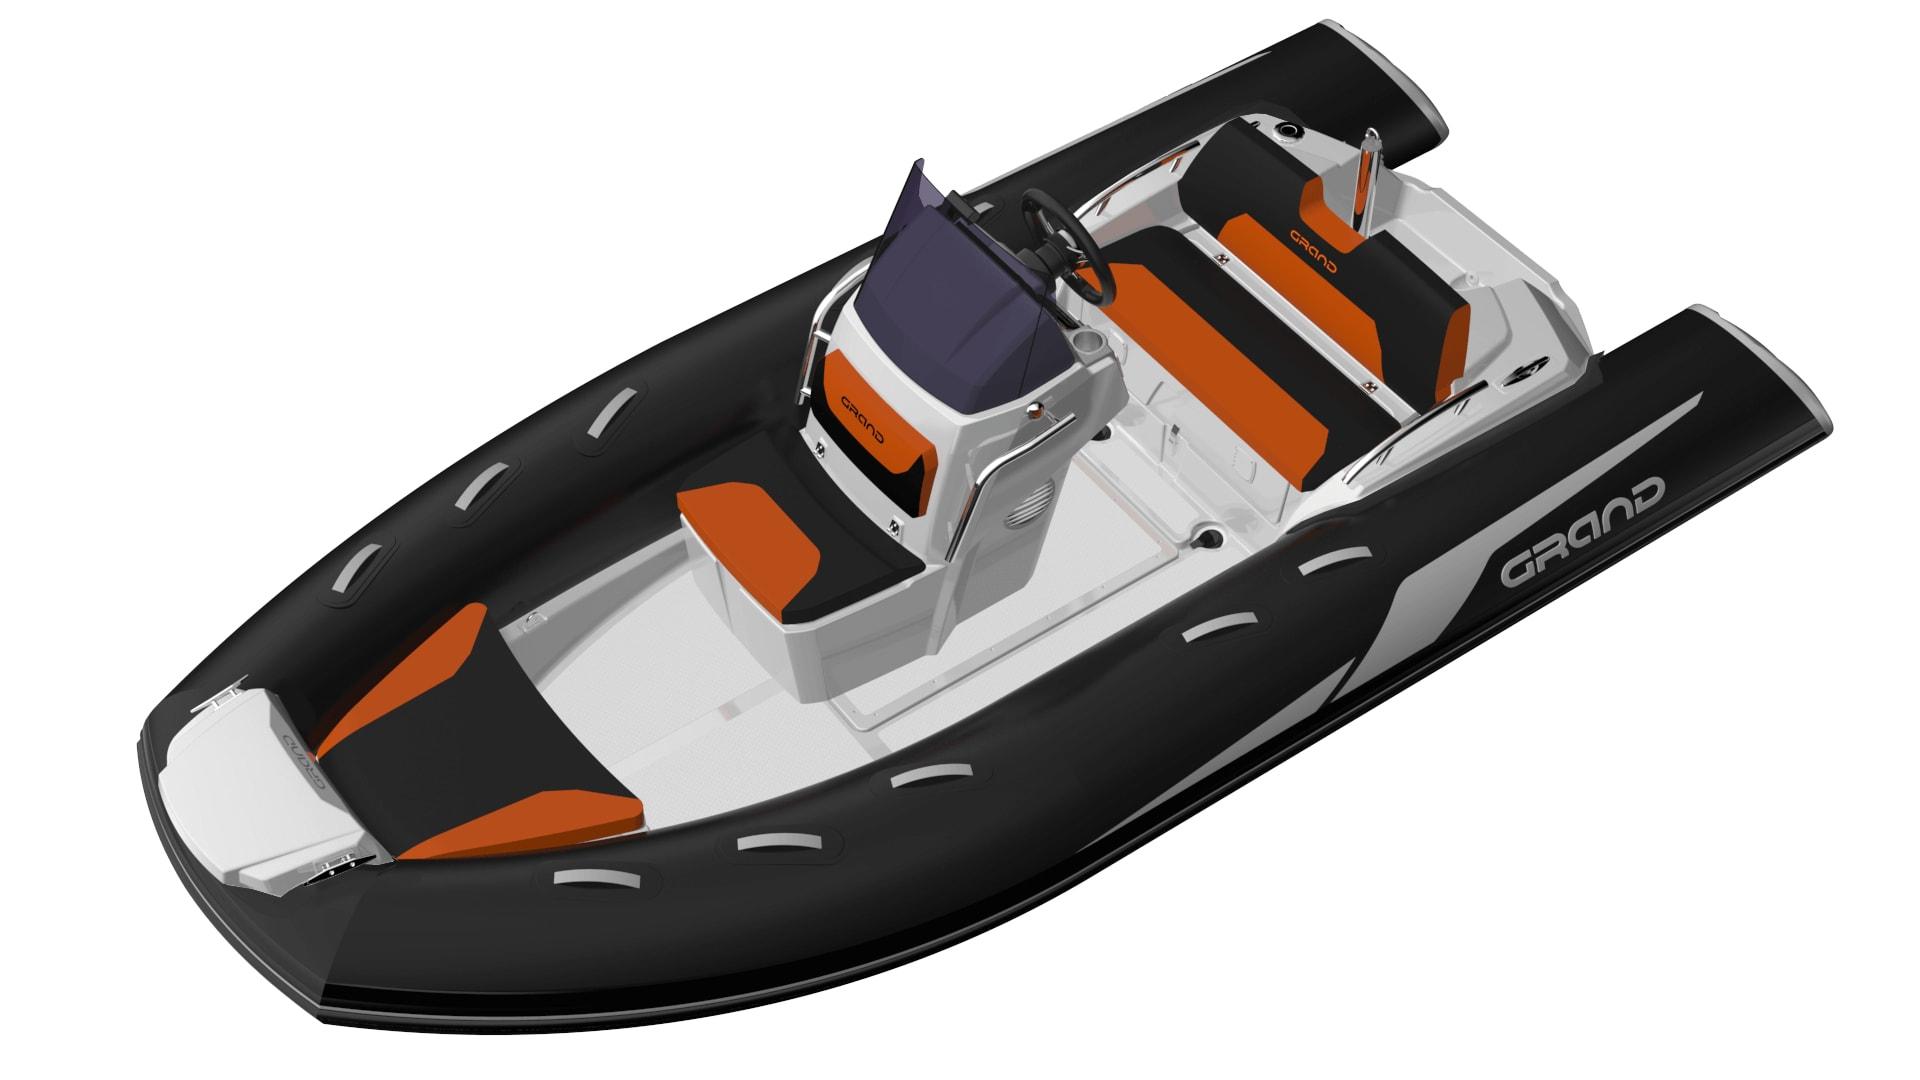 Grand Golden Line G420LF, Grand Golden Line G420, Golden Line G420, GRAND G420, G420, Надувная лодка GRAND Golden Line G420, Надувная лодка GRAND G420, Надувная лодка с жестким дном, Rigid Inflatable Boats, RIB